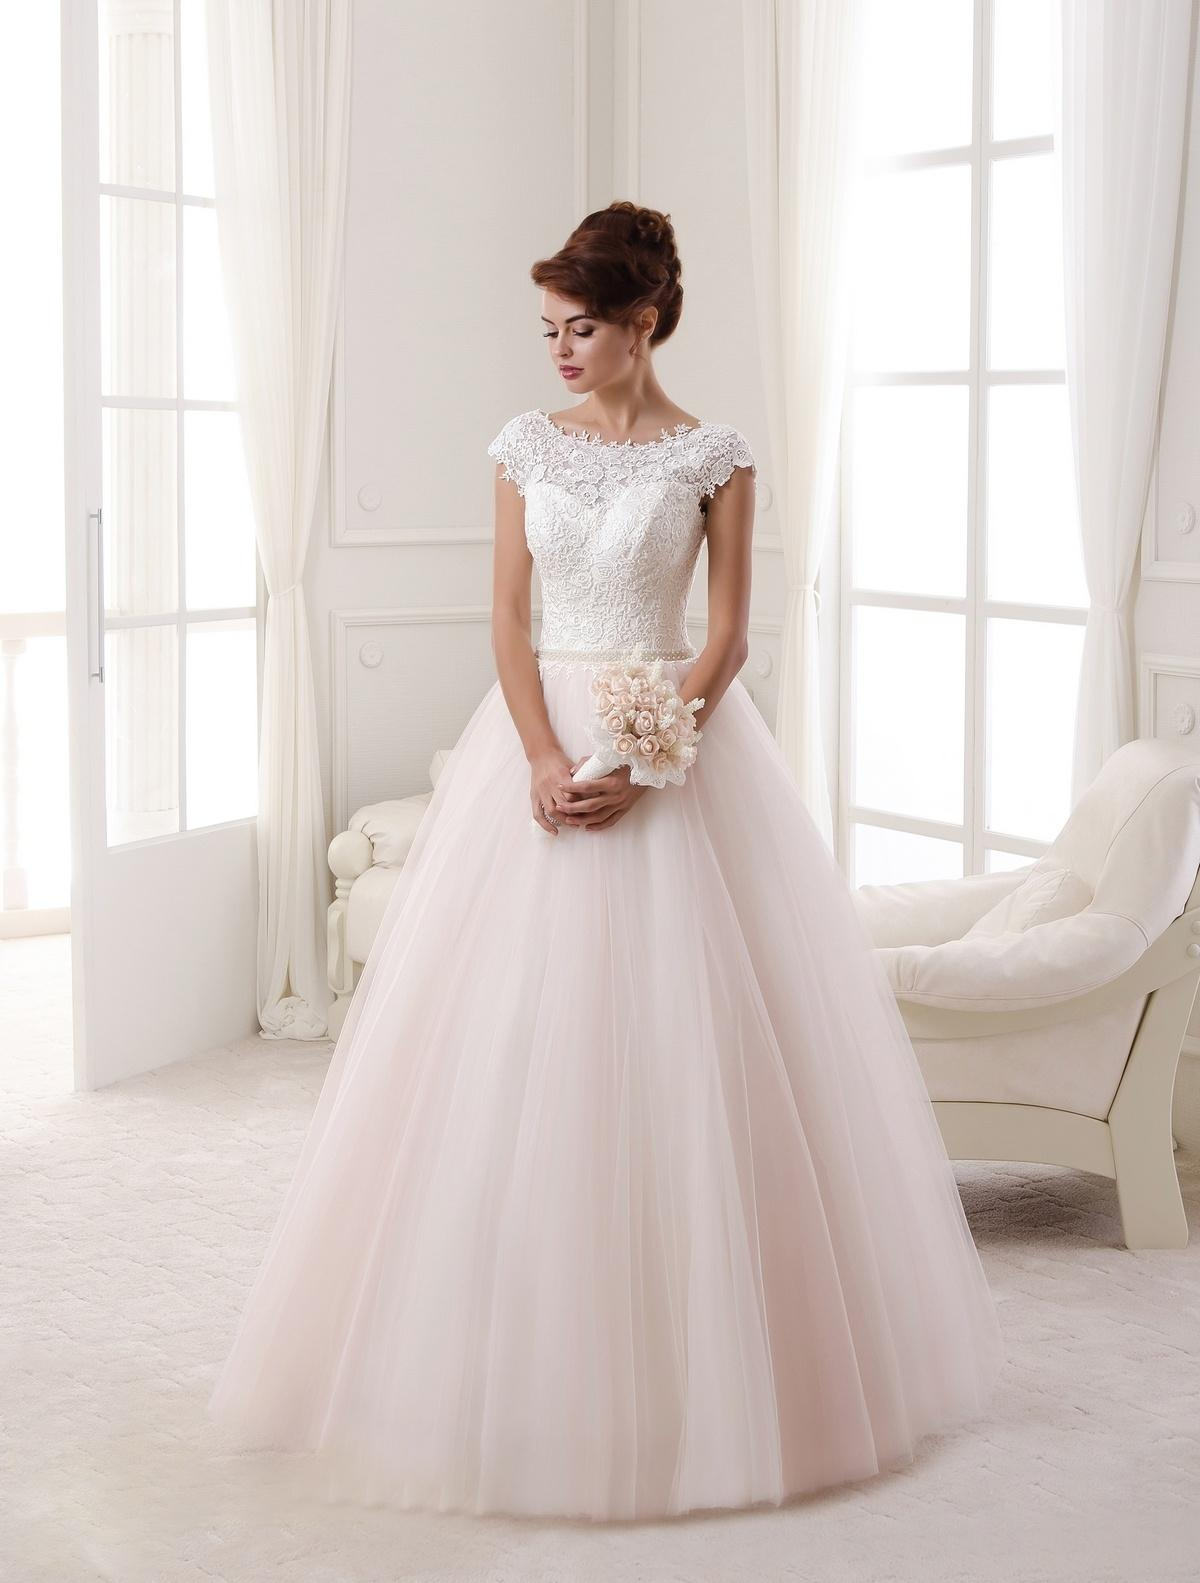 Svadobné šaty NOVÉ 16-295 - Obrázok č. 1